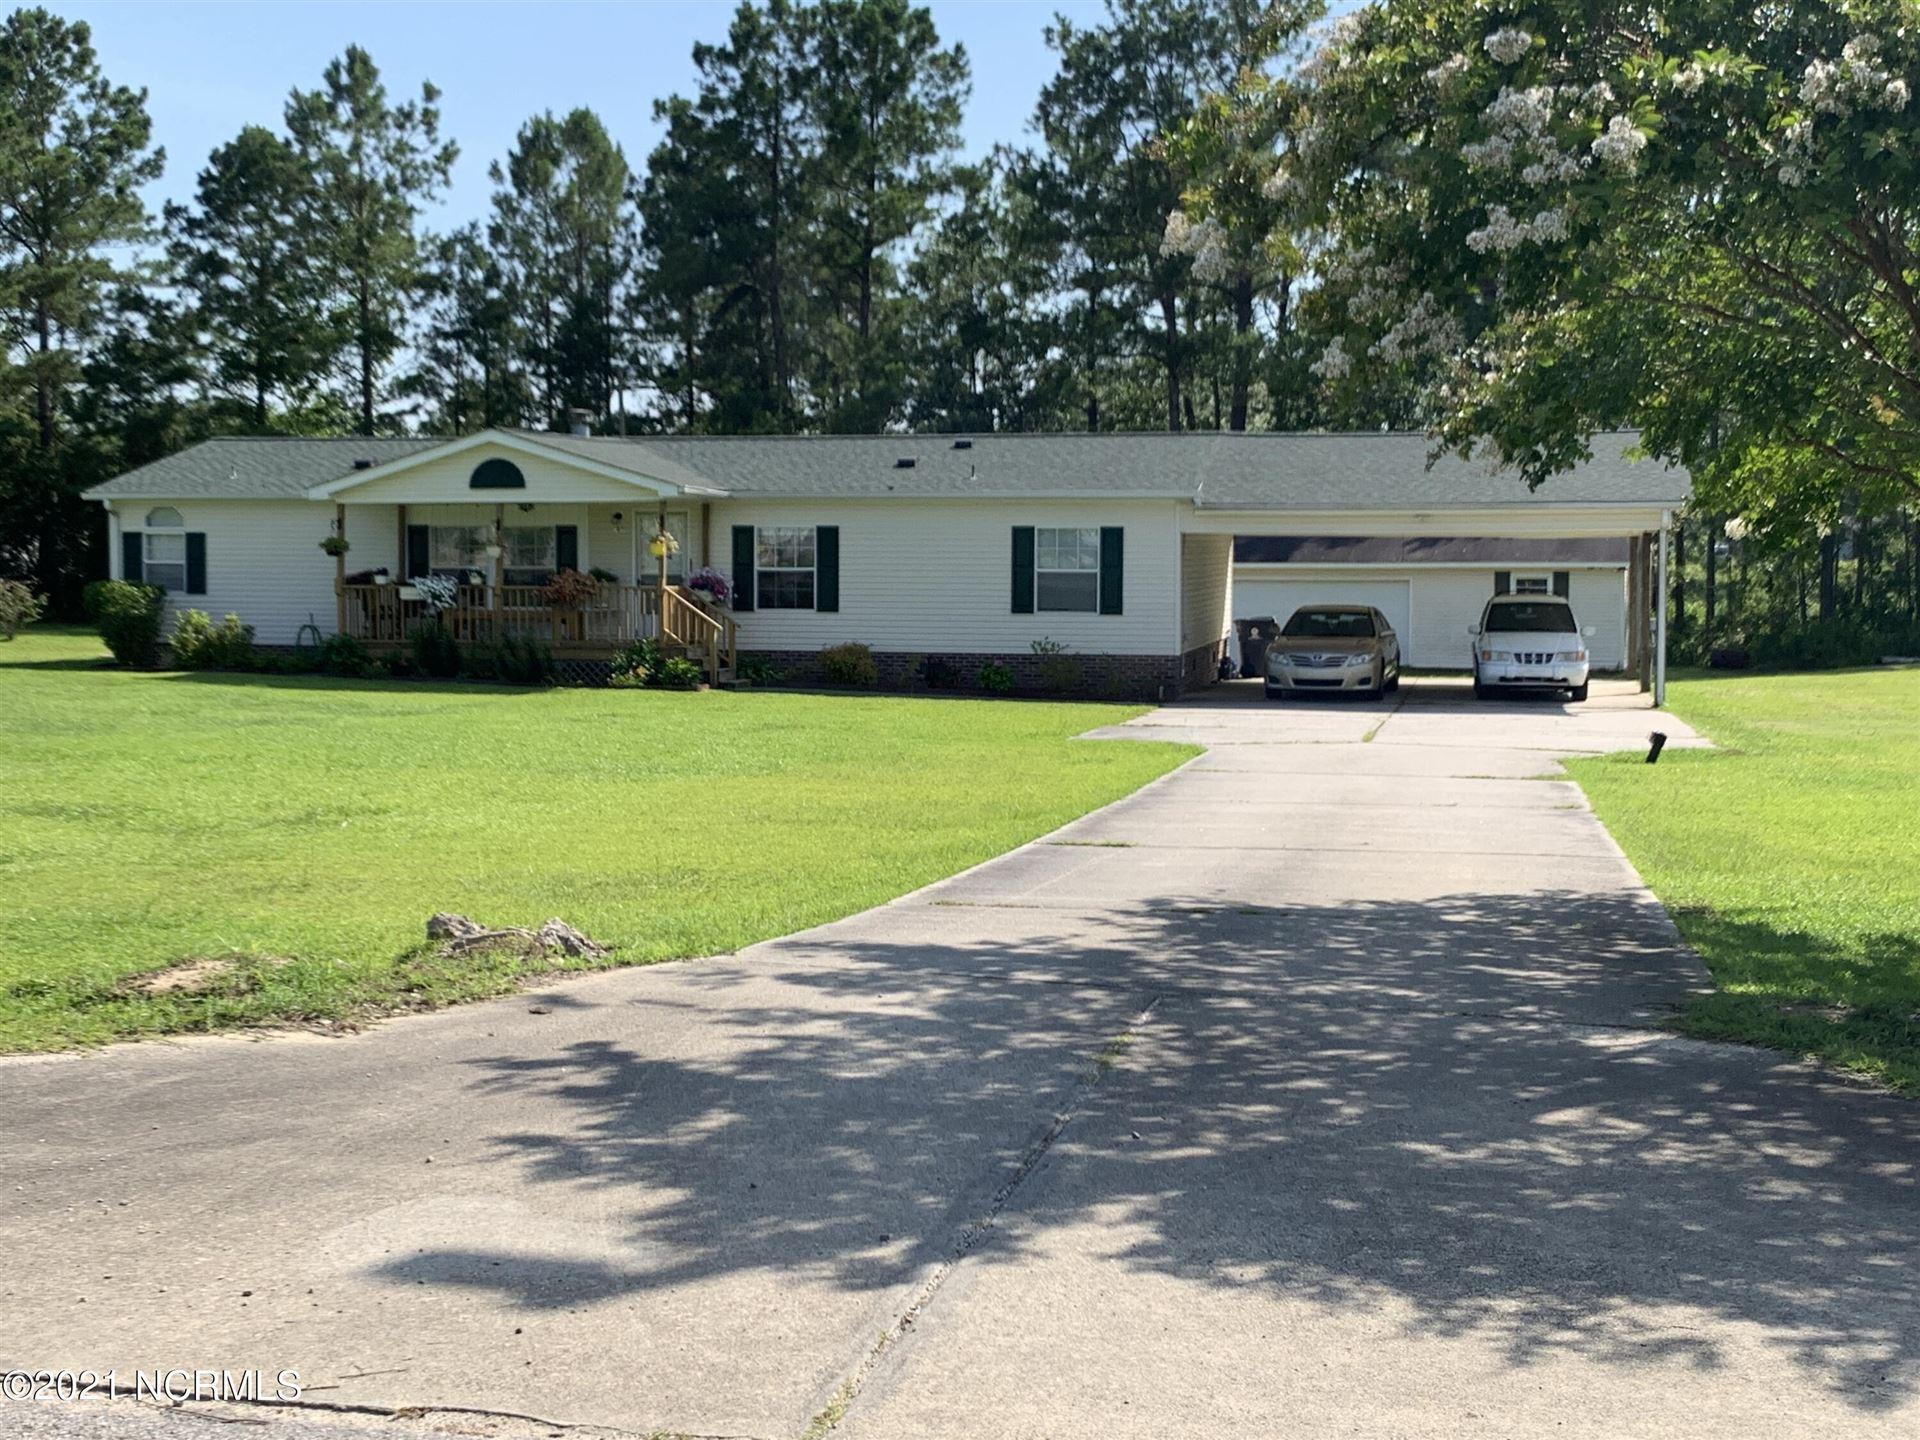 Photo for 105 Hewett Burton Road SE, Leland, NC 28451 (MLS # 100280619)